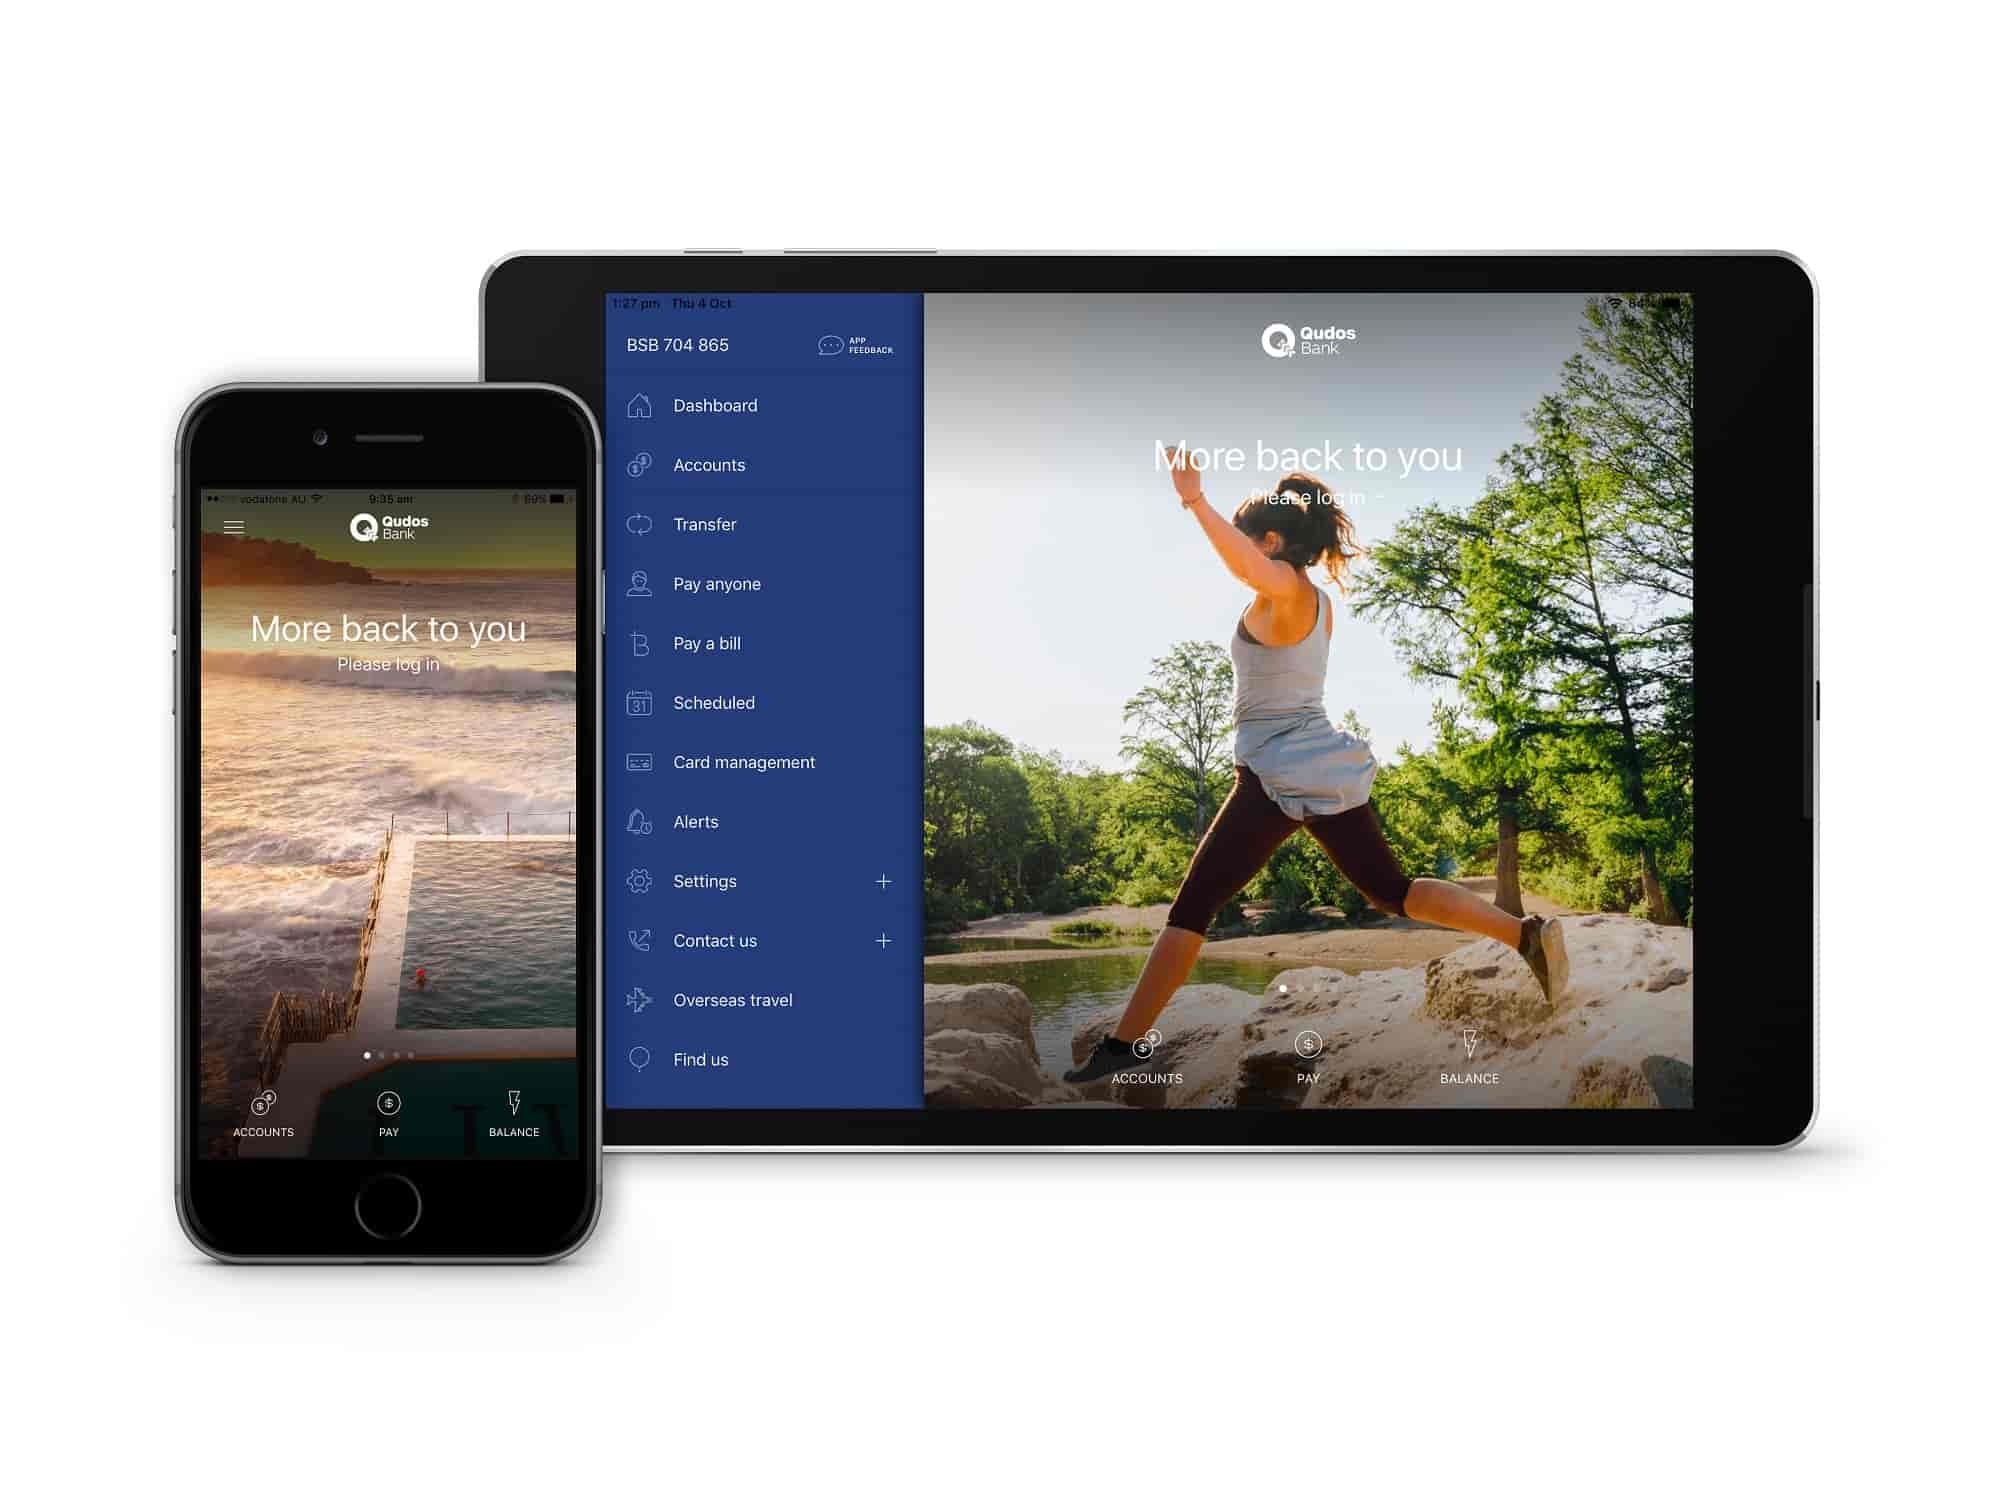 Qudos Bank App - Qudos Bank